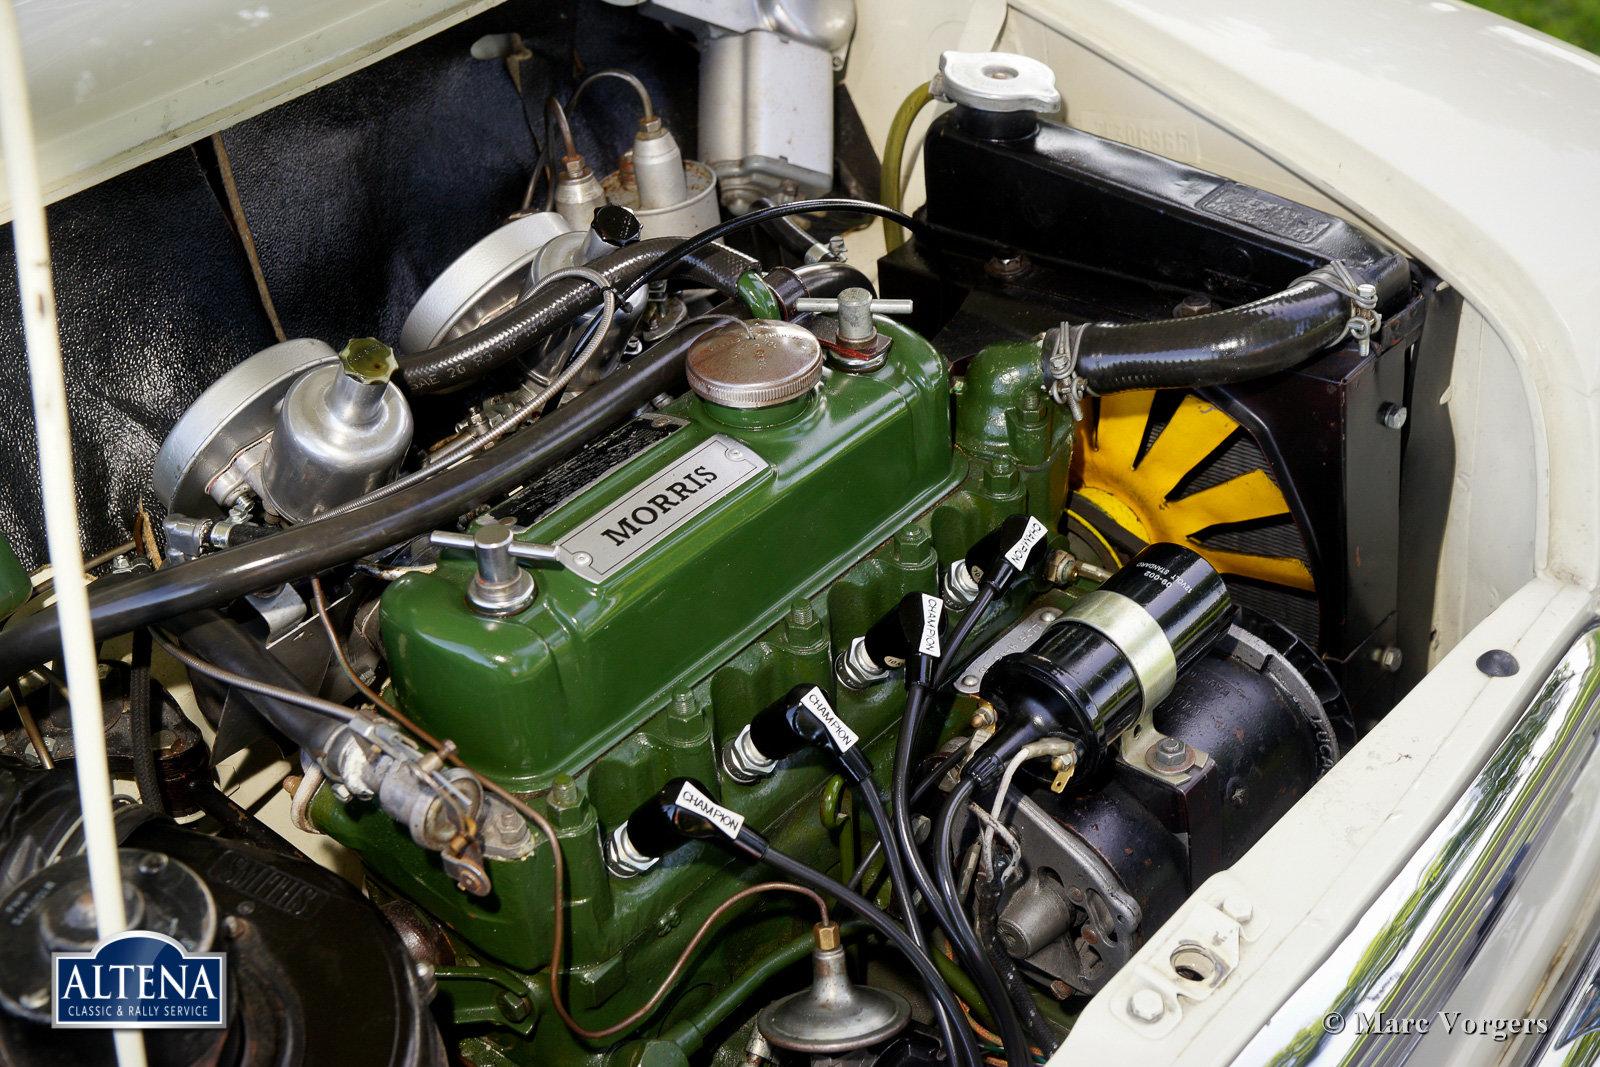 Mini/Morris Cooper 997 CC, 1962 For Sale (picture 3 of 6)